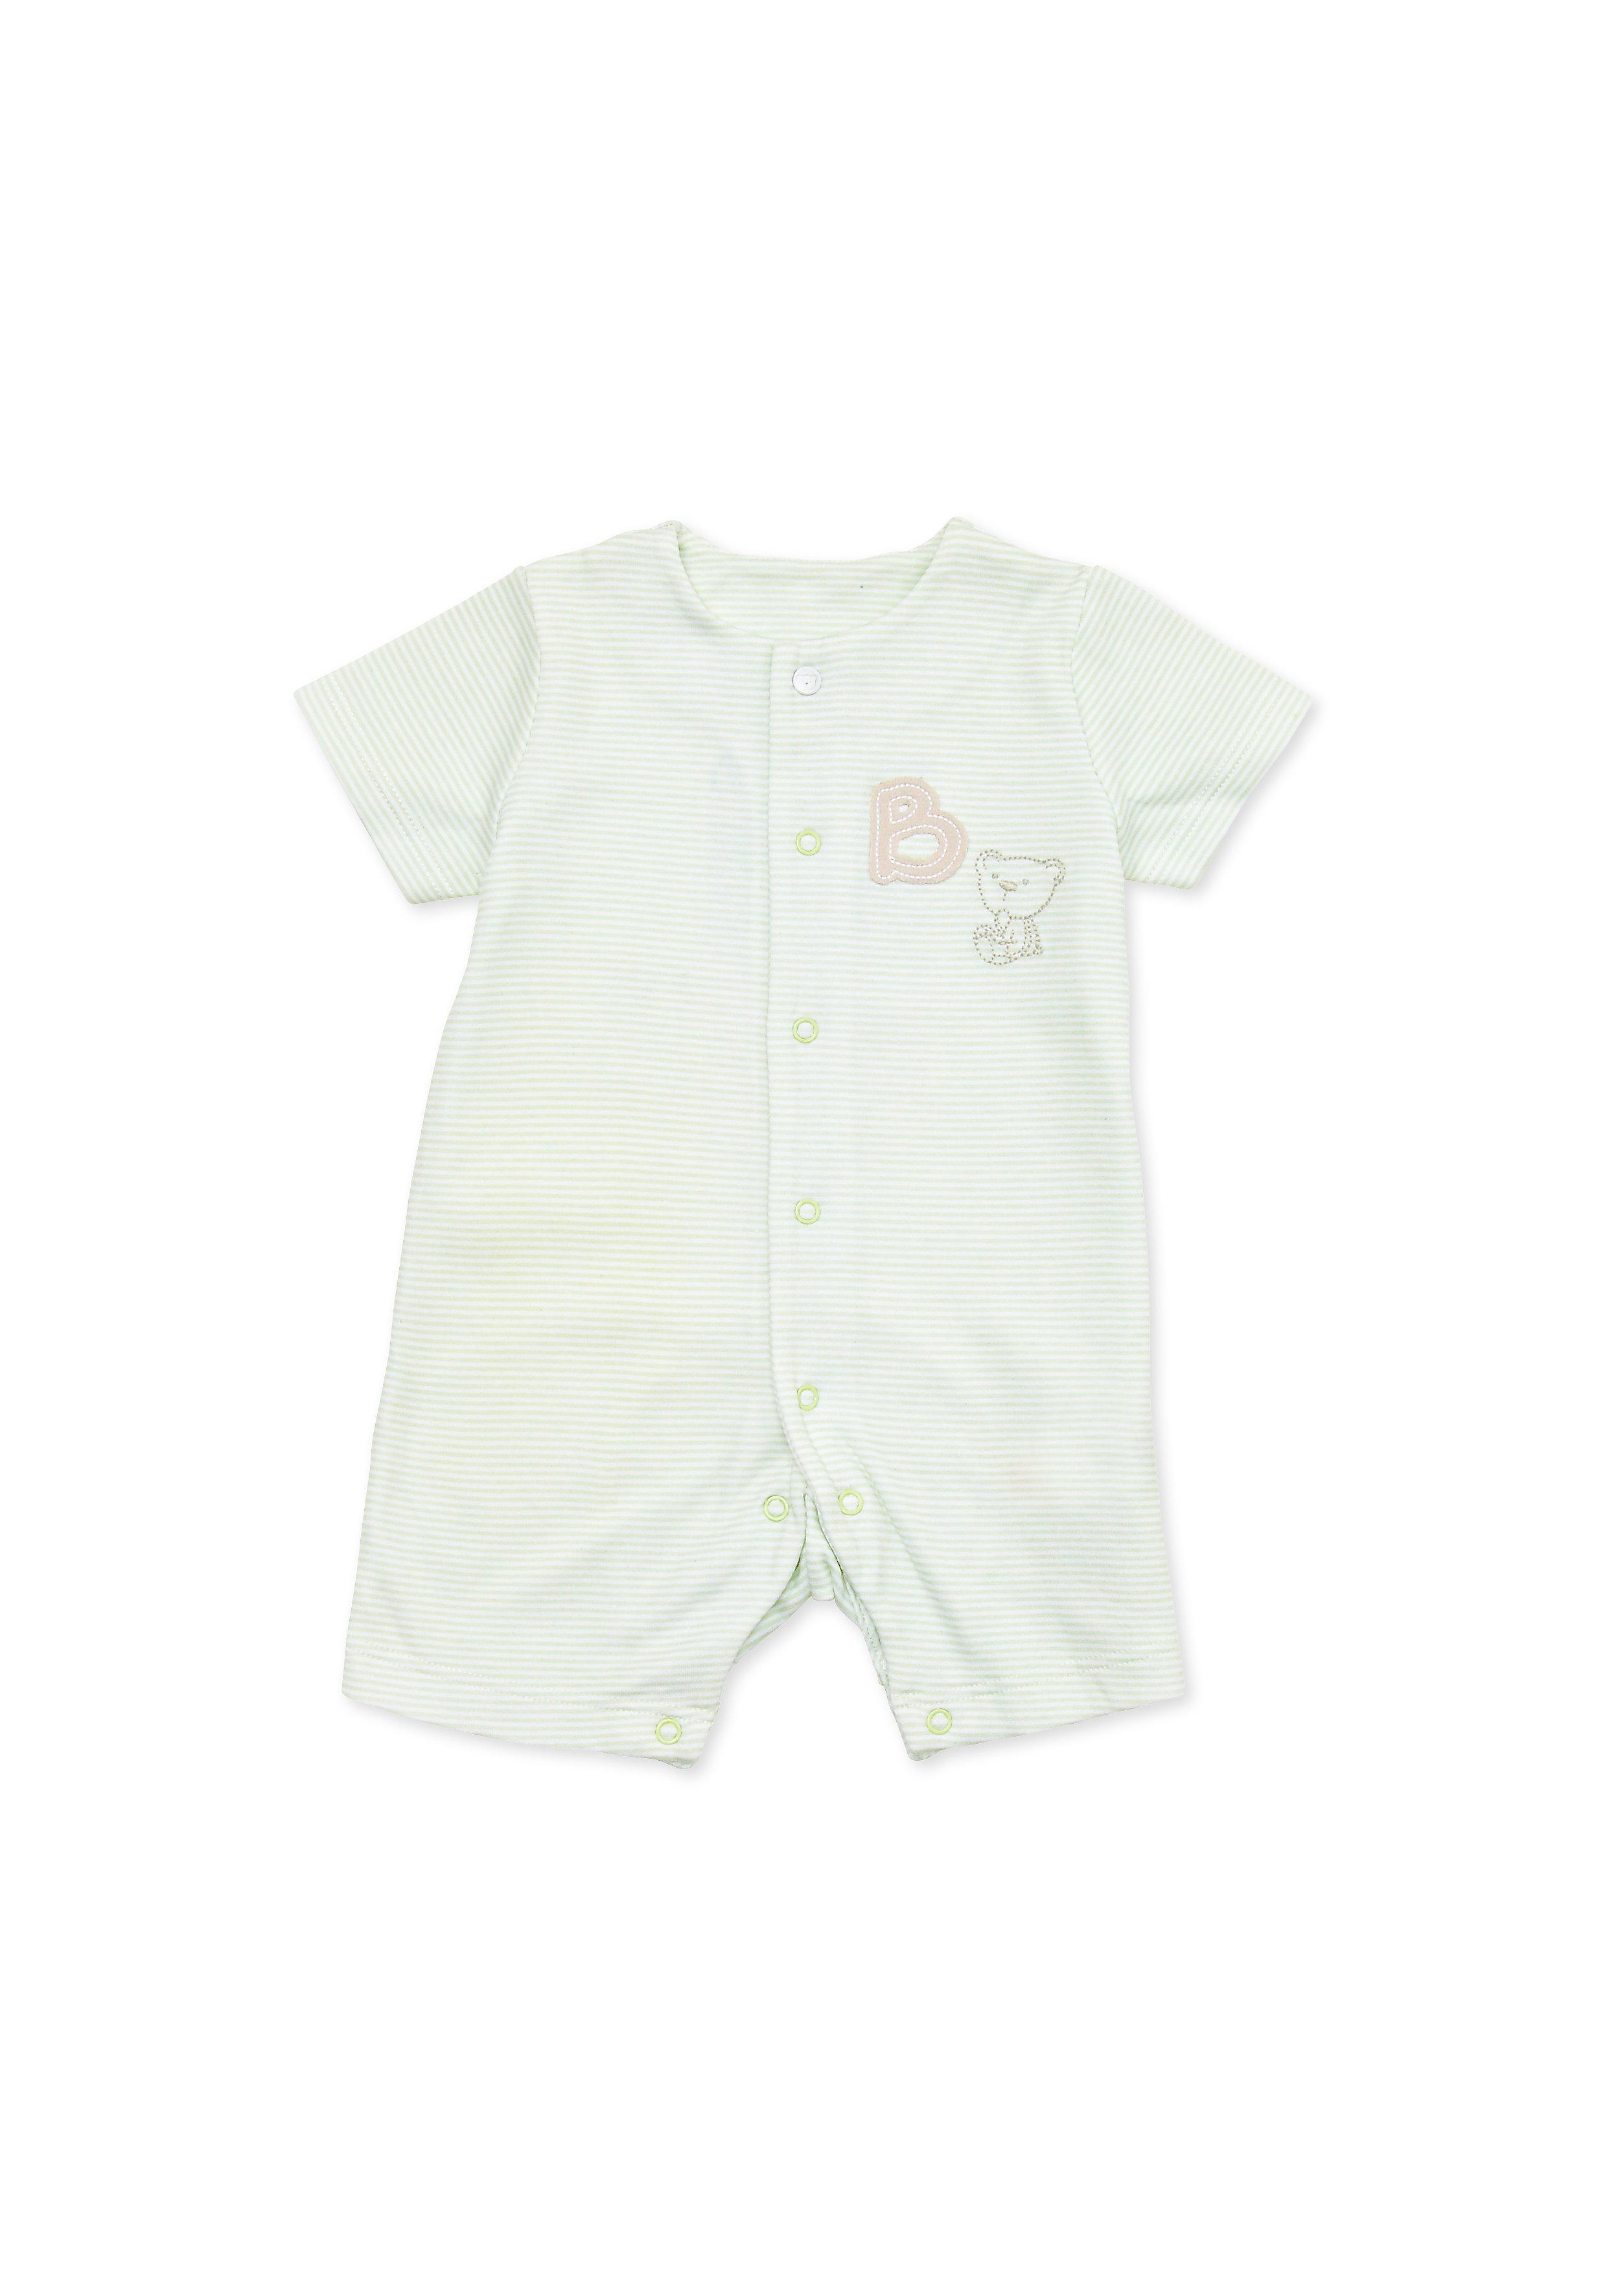 Mothercare   Boys Half Sleeves Romper Bear Embroidery - Grey